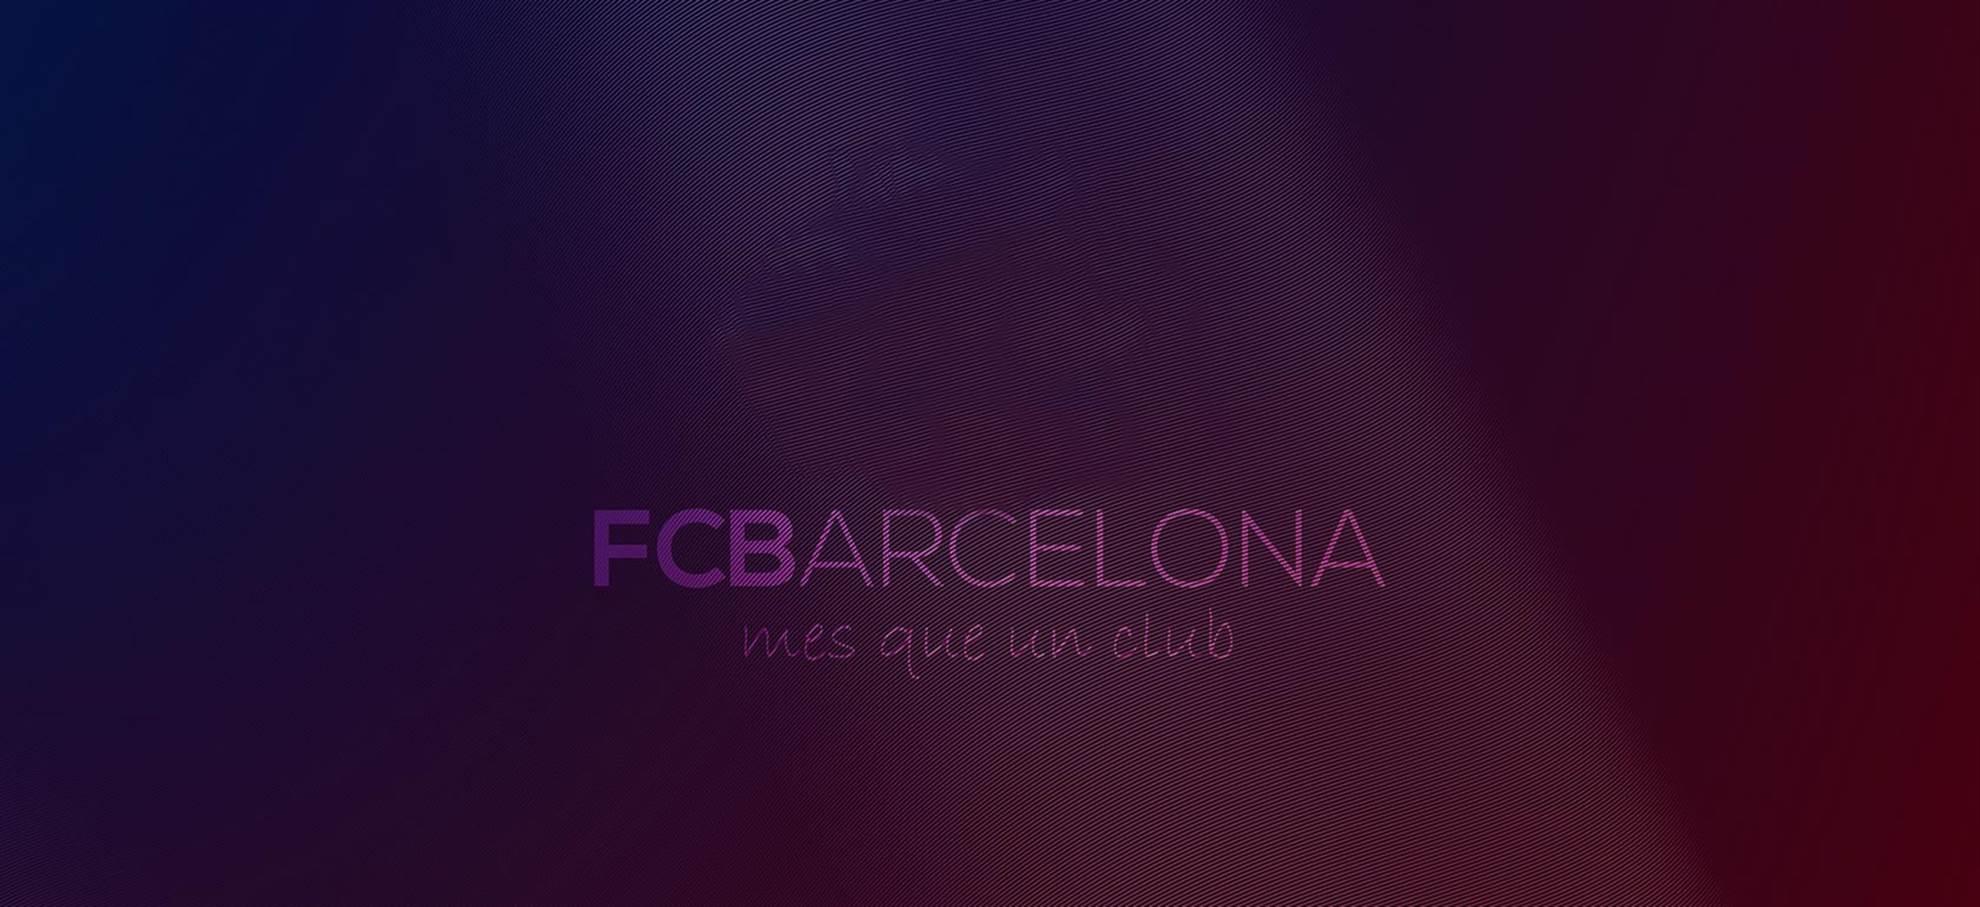 FC Barcelona - Napoli (18-03-2020)